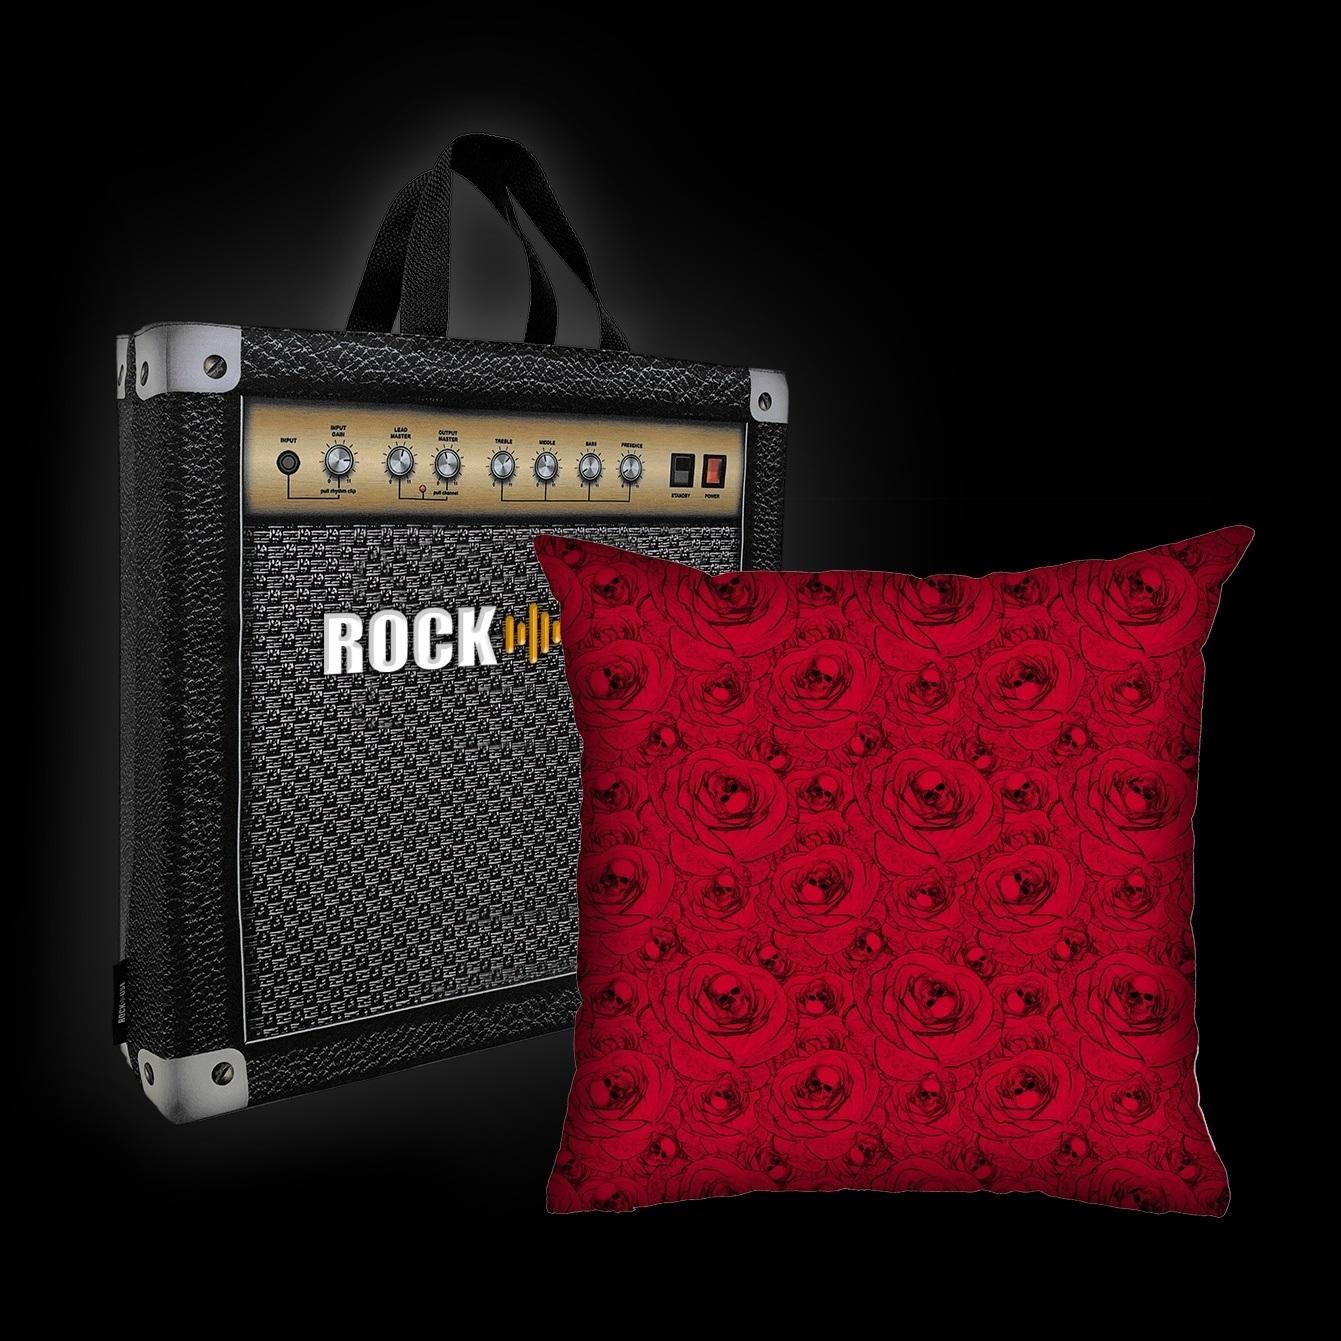 Kit Almofada & Sacola Rock Use - Skull & Roses - Vermelha